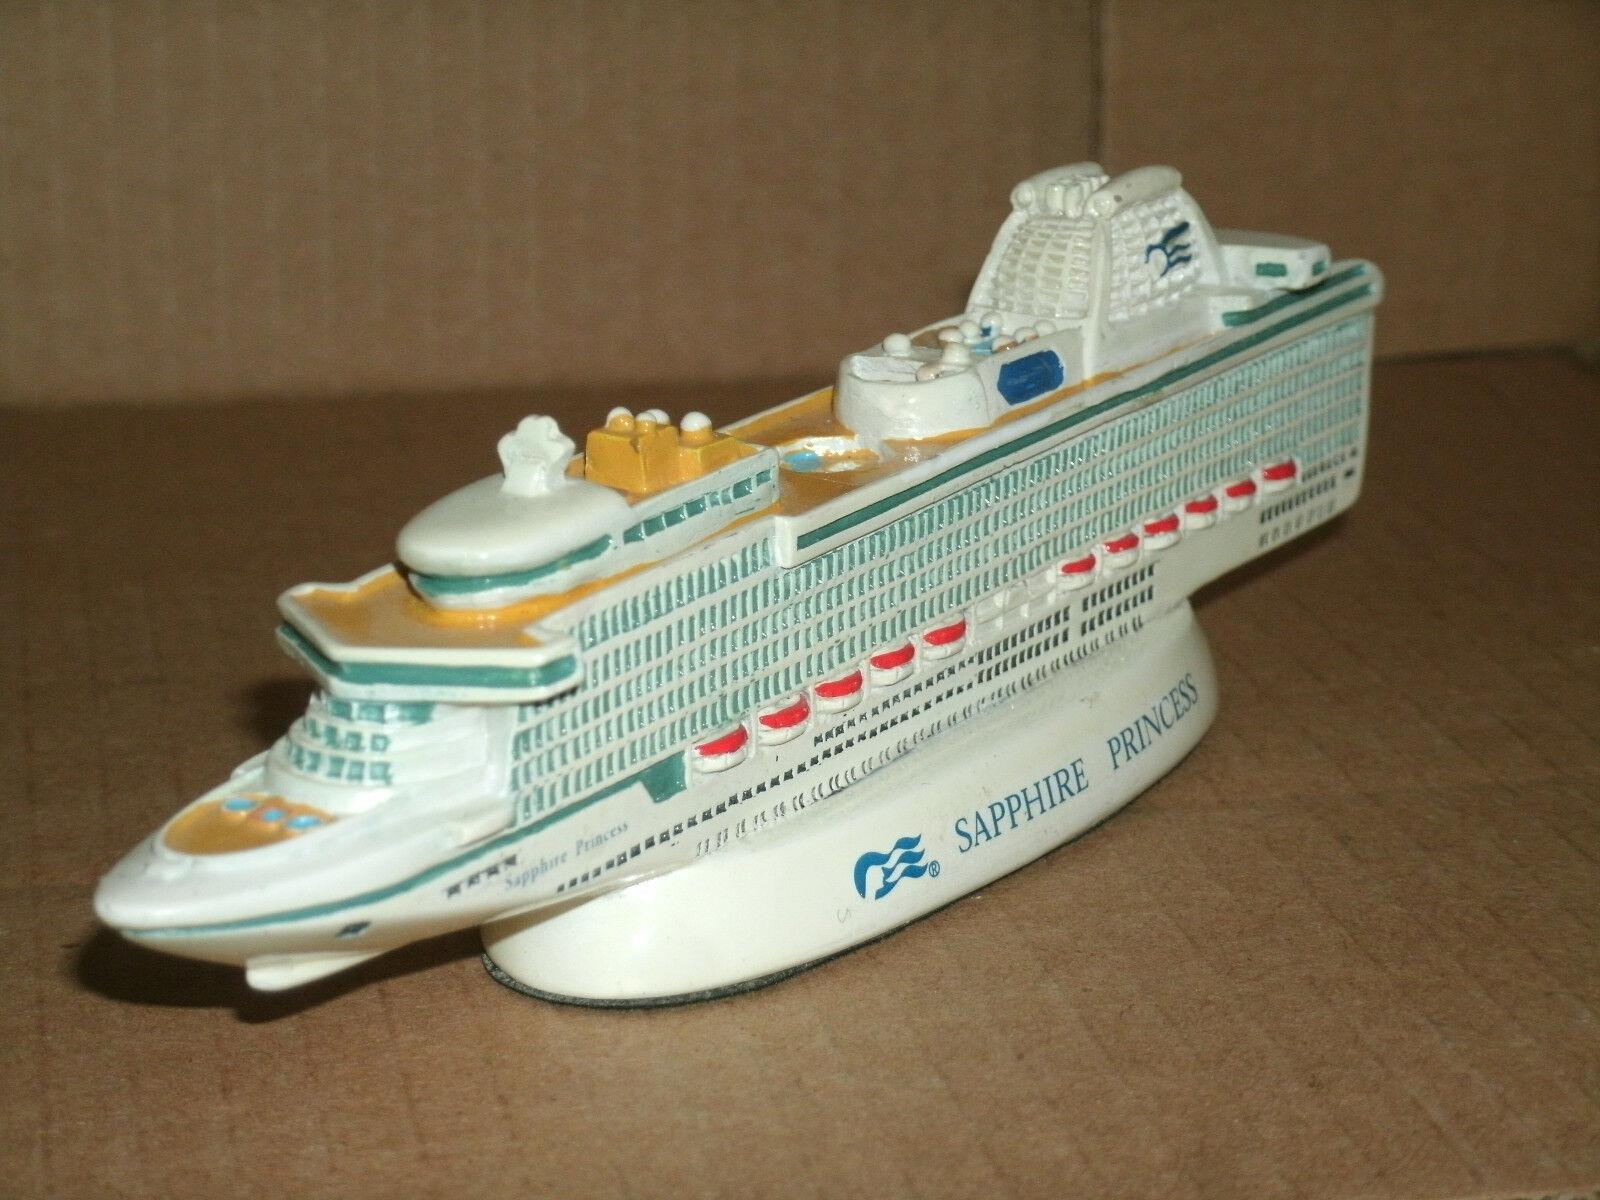 1 1740 Scale Sapphire Princess Cruise Ship Resin Model Collectible 6.5  Replica